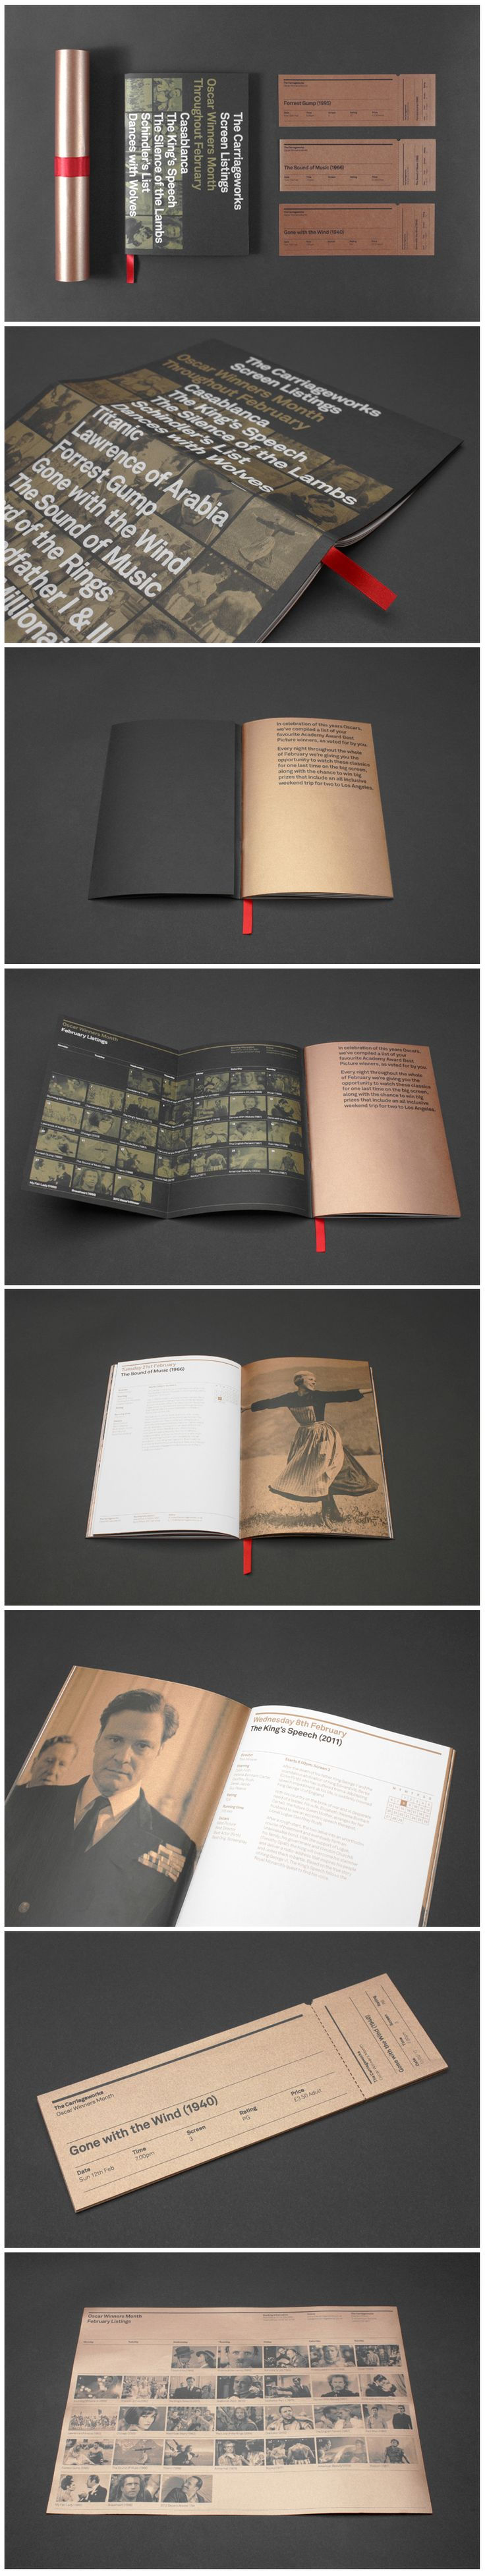 The Carriageworks | #magazine #layout